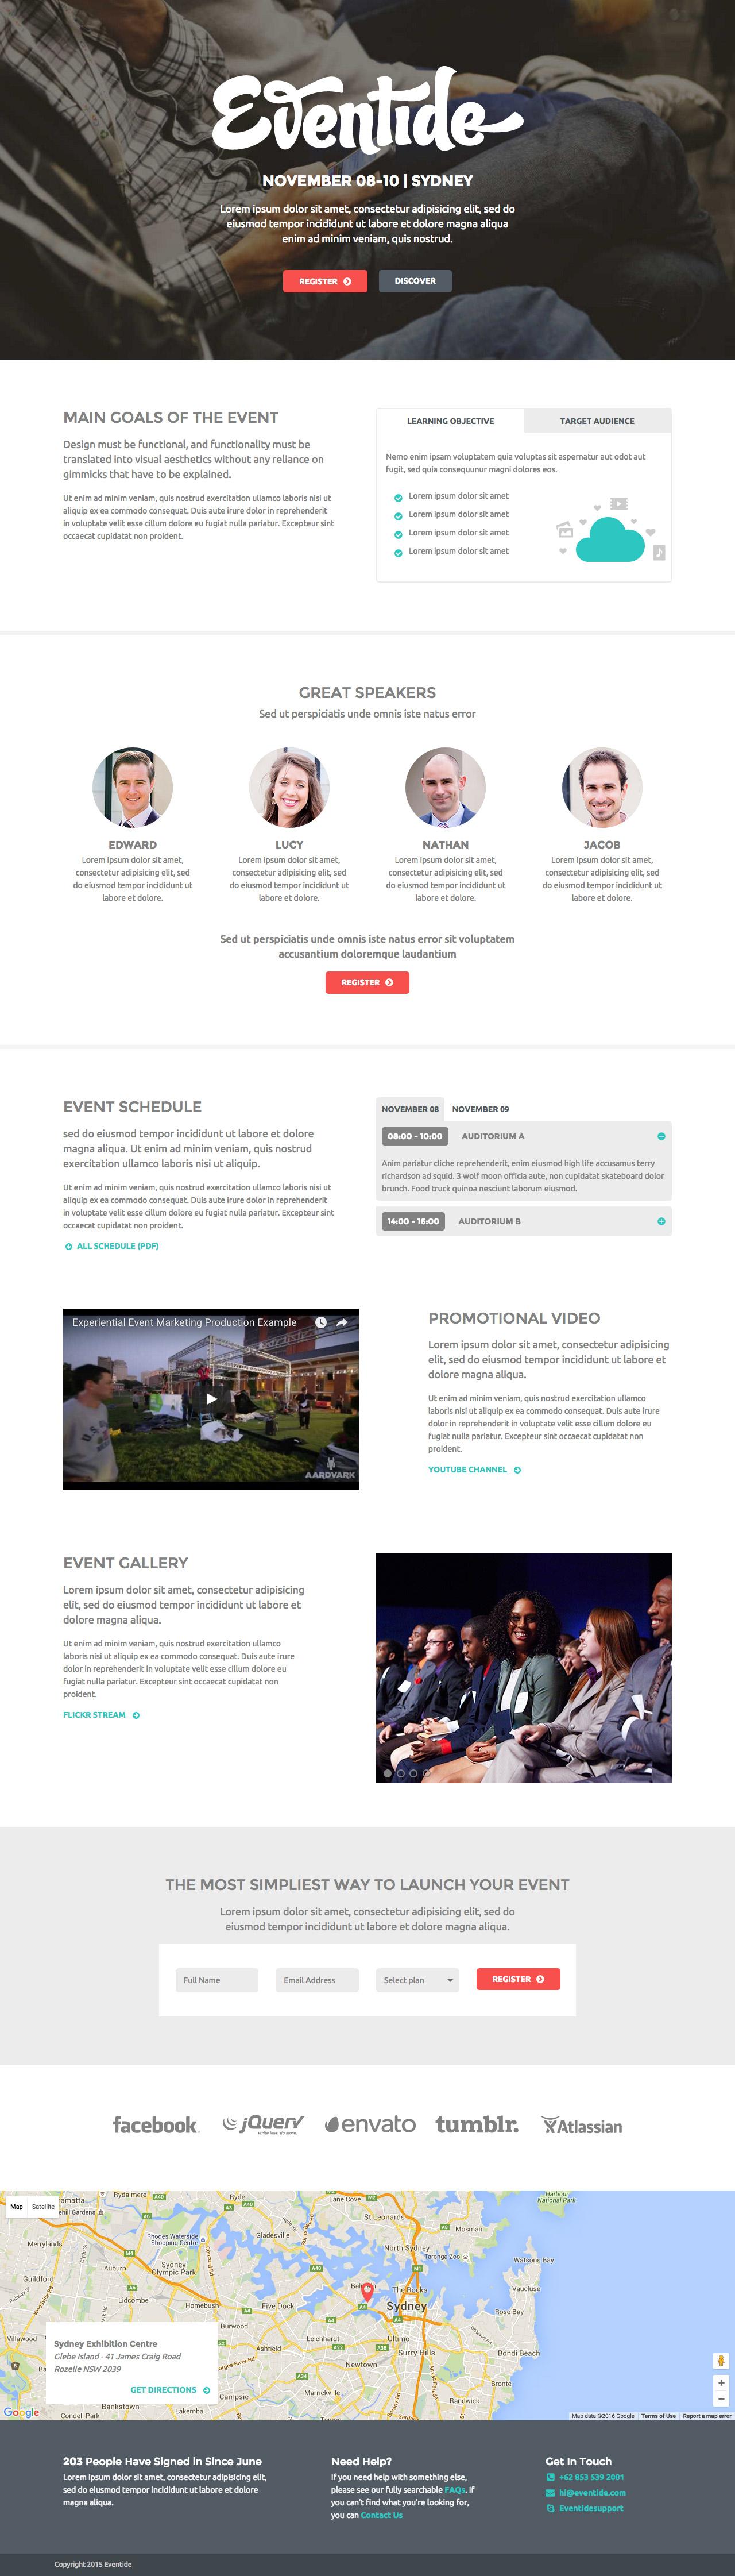 Eventide Website Screenshot